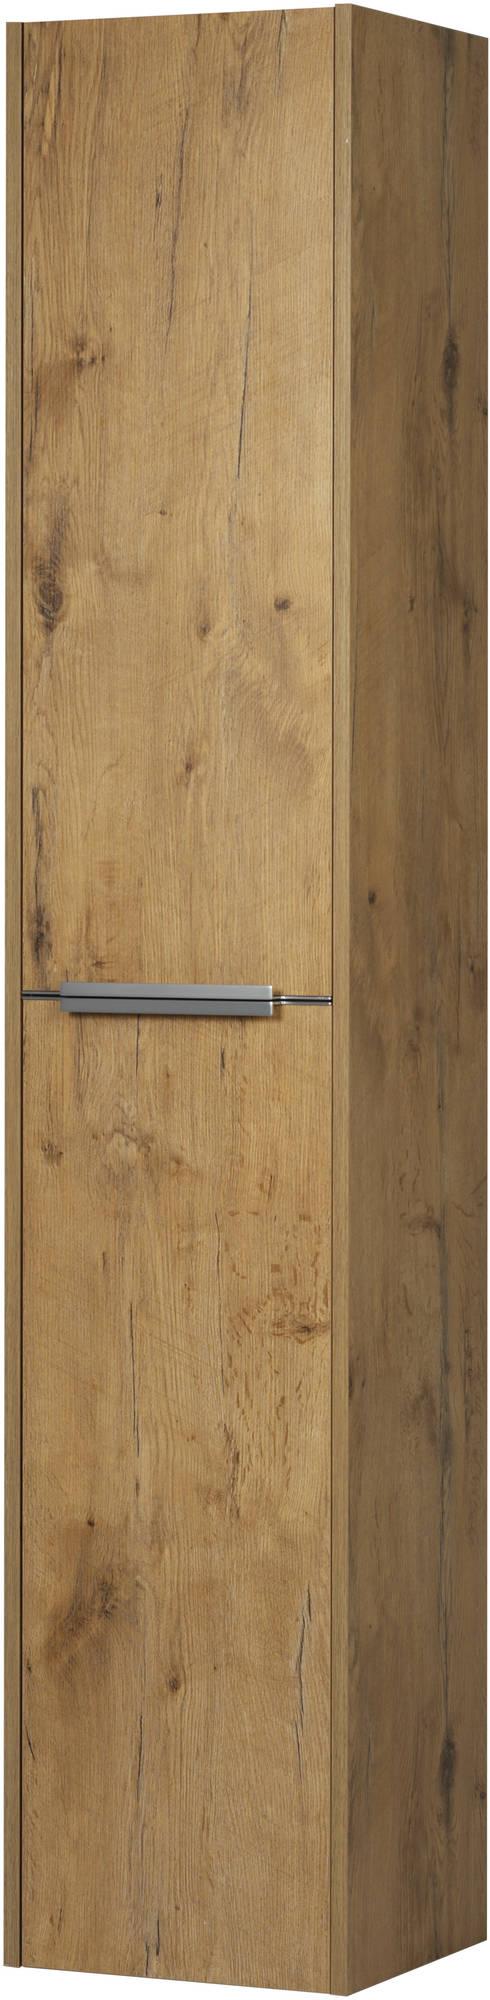 Saniselect Socan Hoge kast 35x32x180 cm Wild Eiken